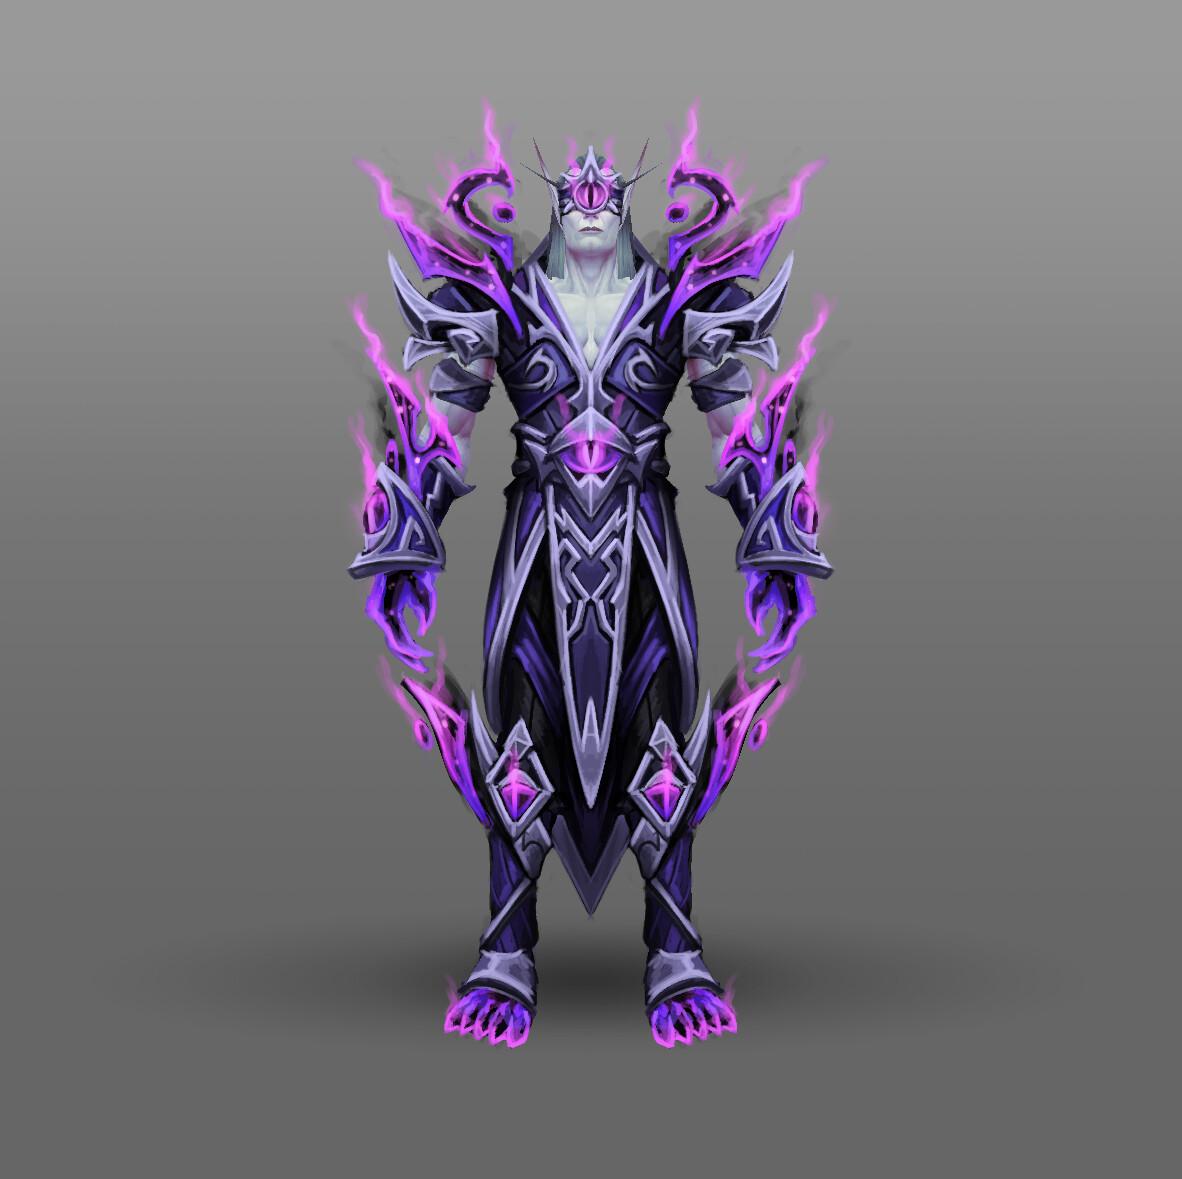 Artstation Fan Art World Of Warcraft Racial Class Armor Design Voidelf Arthur Lorenz Heritage of the void achievement + void elf heritage armor. of warcraft racial class armor design